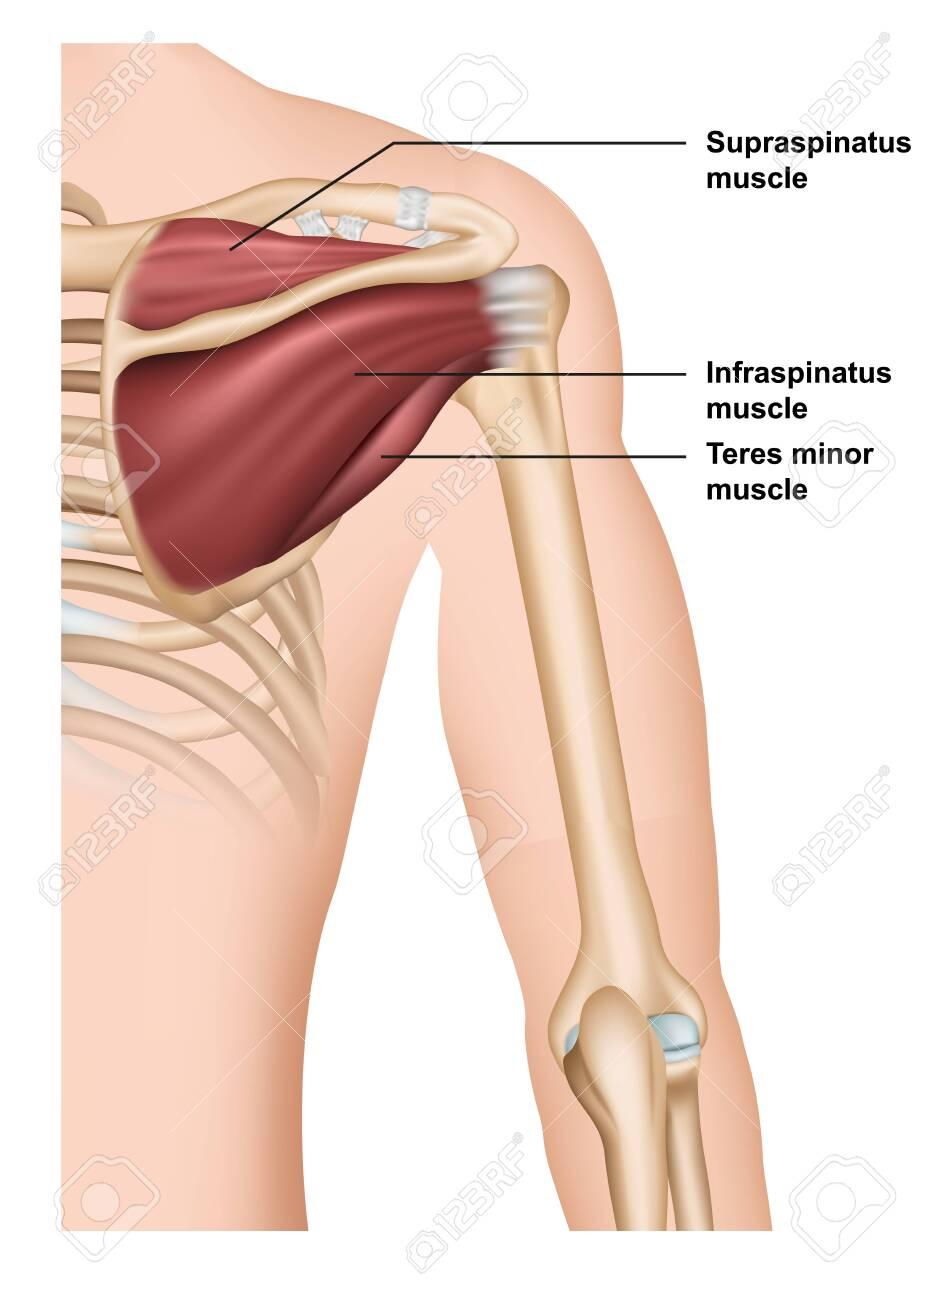 supraspinatus muscle anatomy 3d medical vector illustration - 124273797